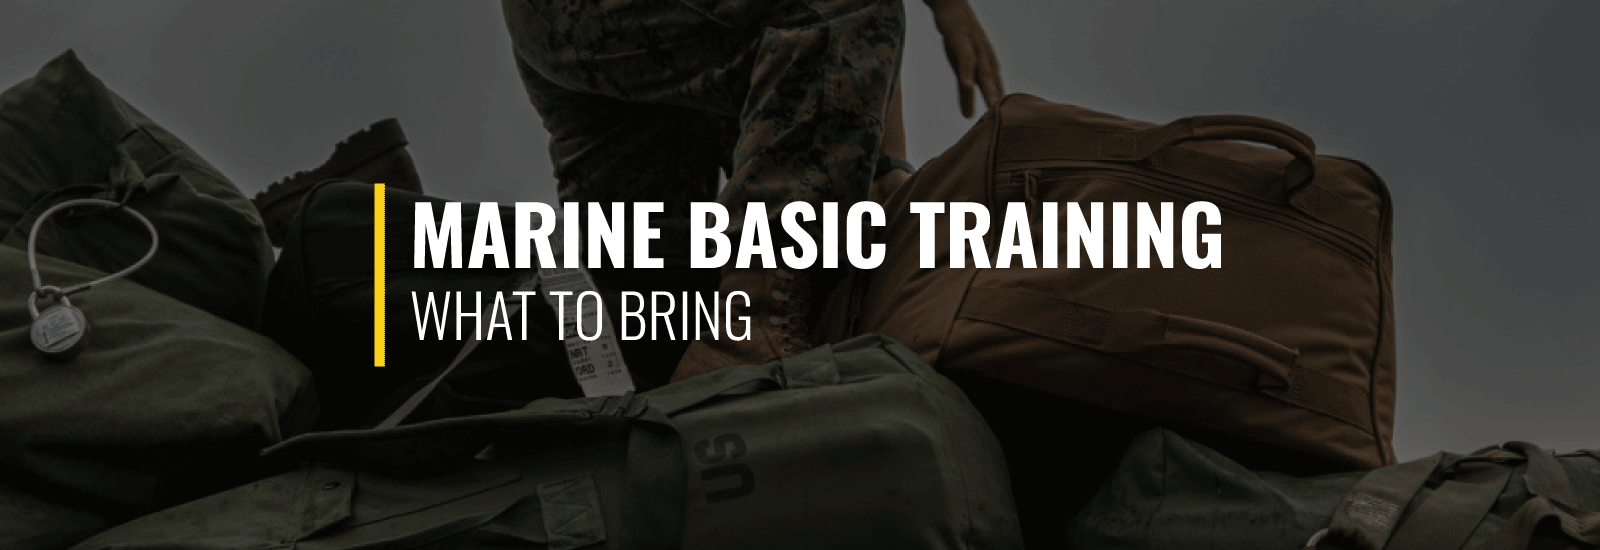 What to Bring to Basic Training Marines?